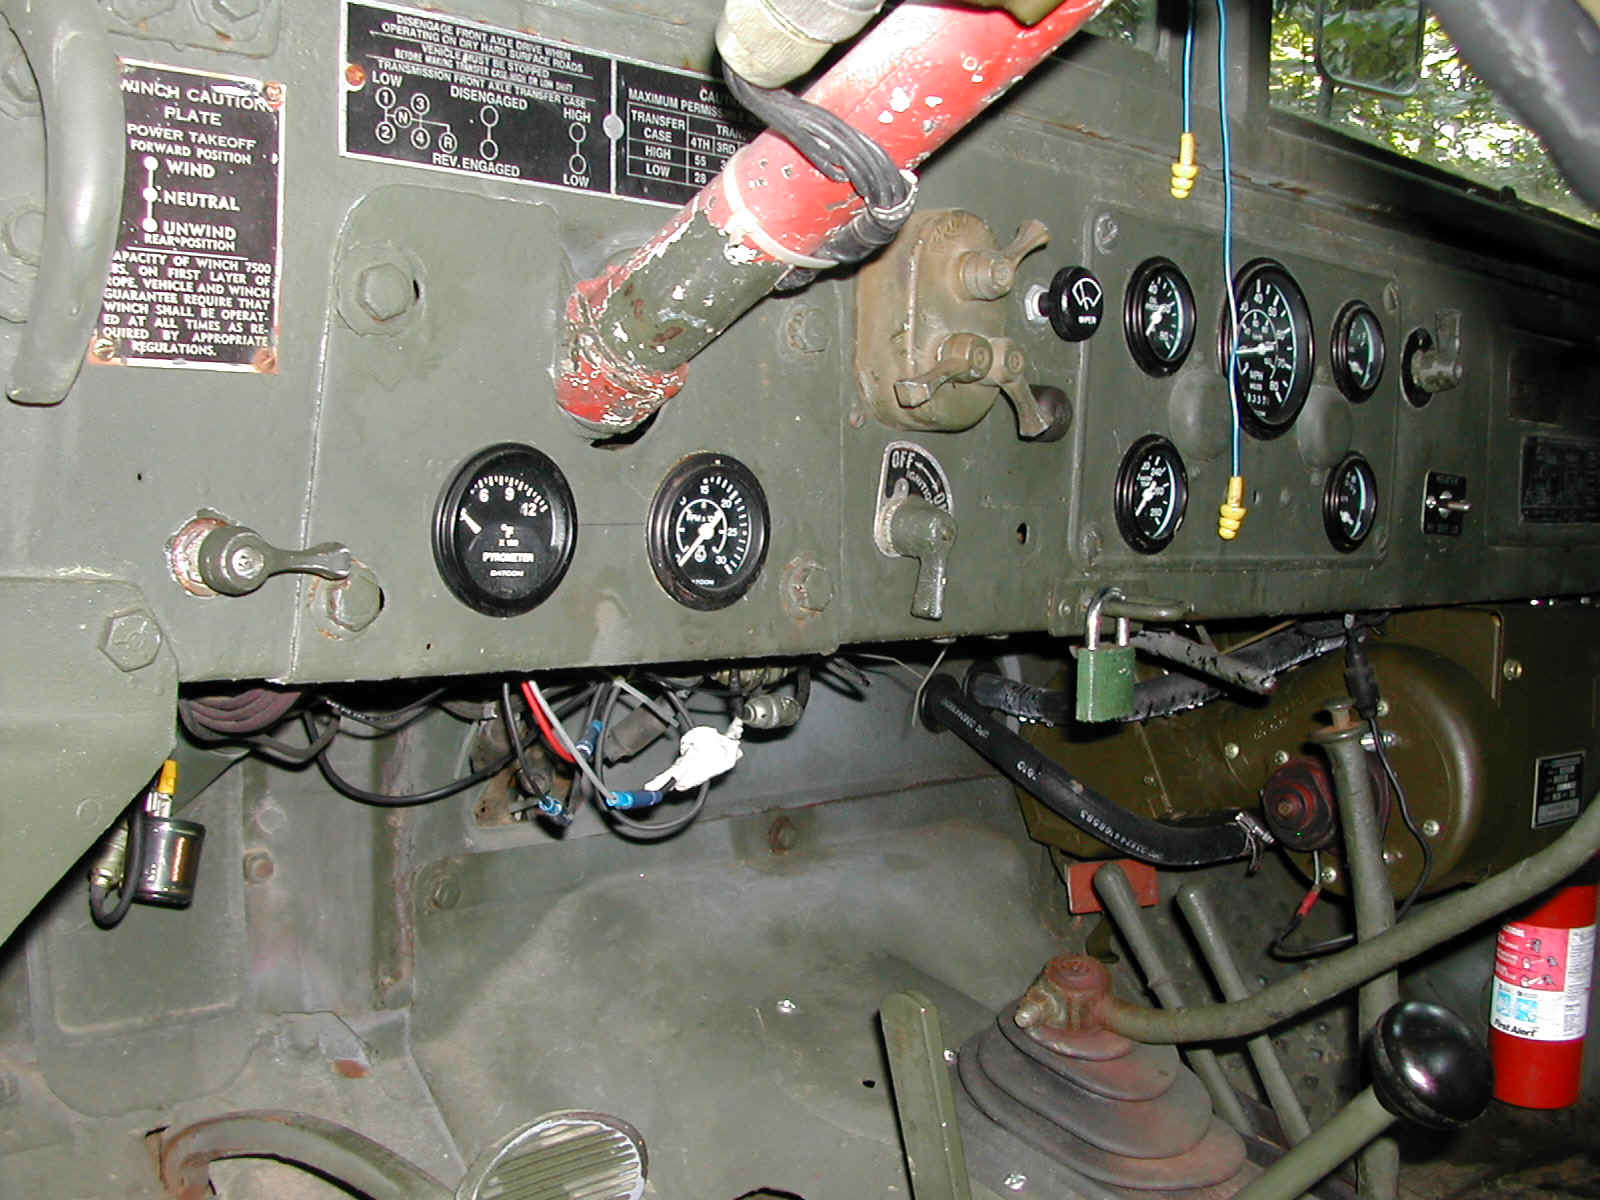 hight resolution of datconguagesdodge m37 wiring harness 19